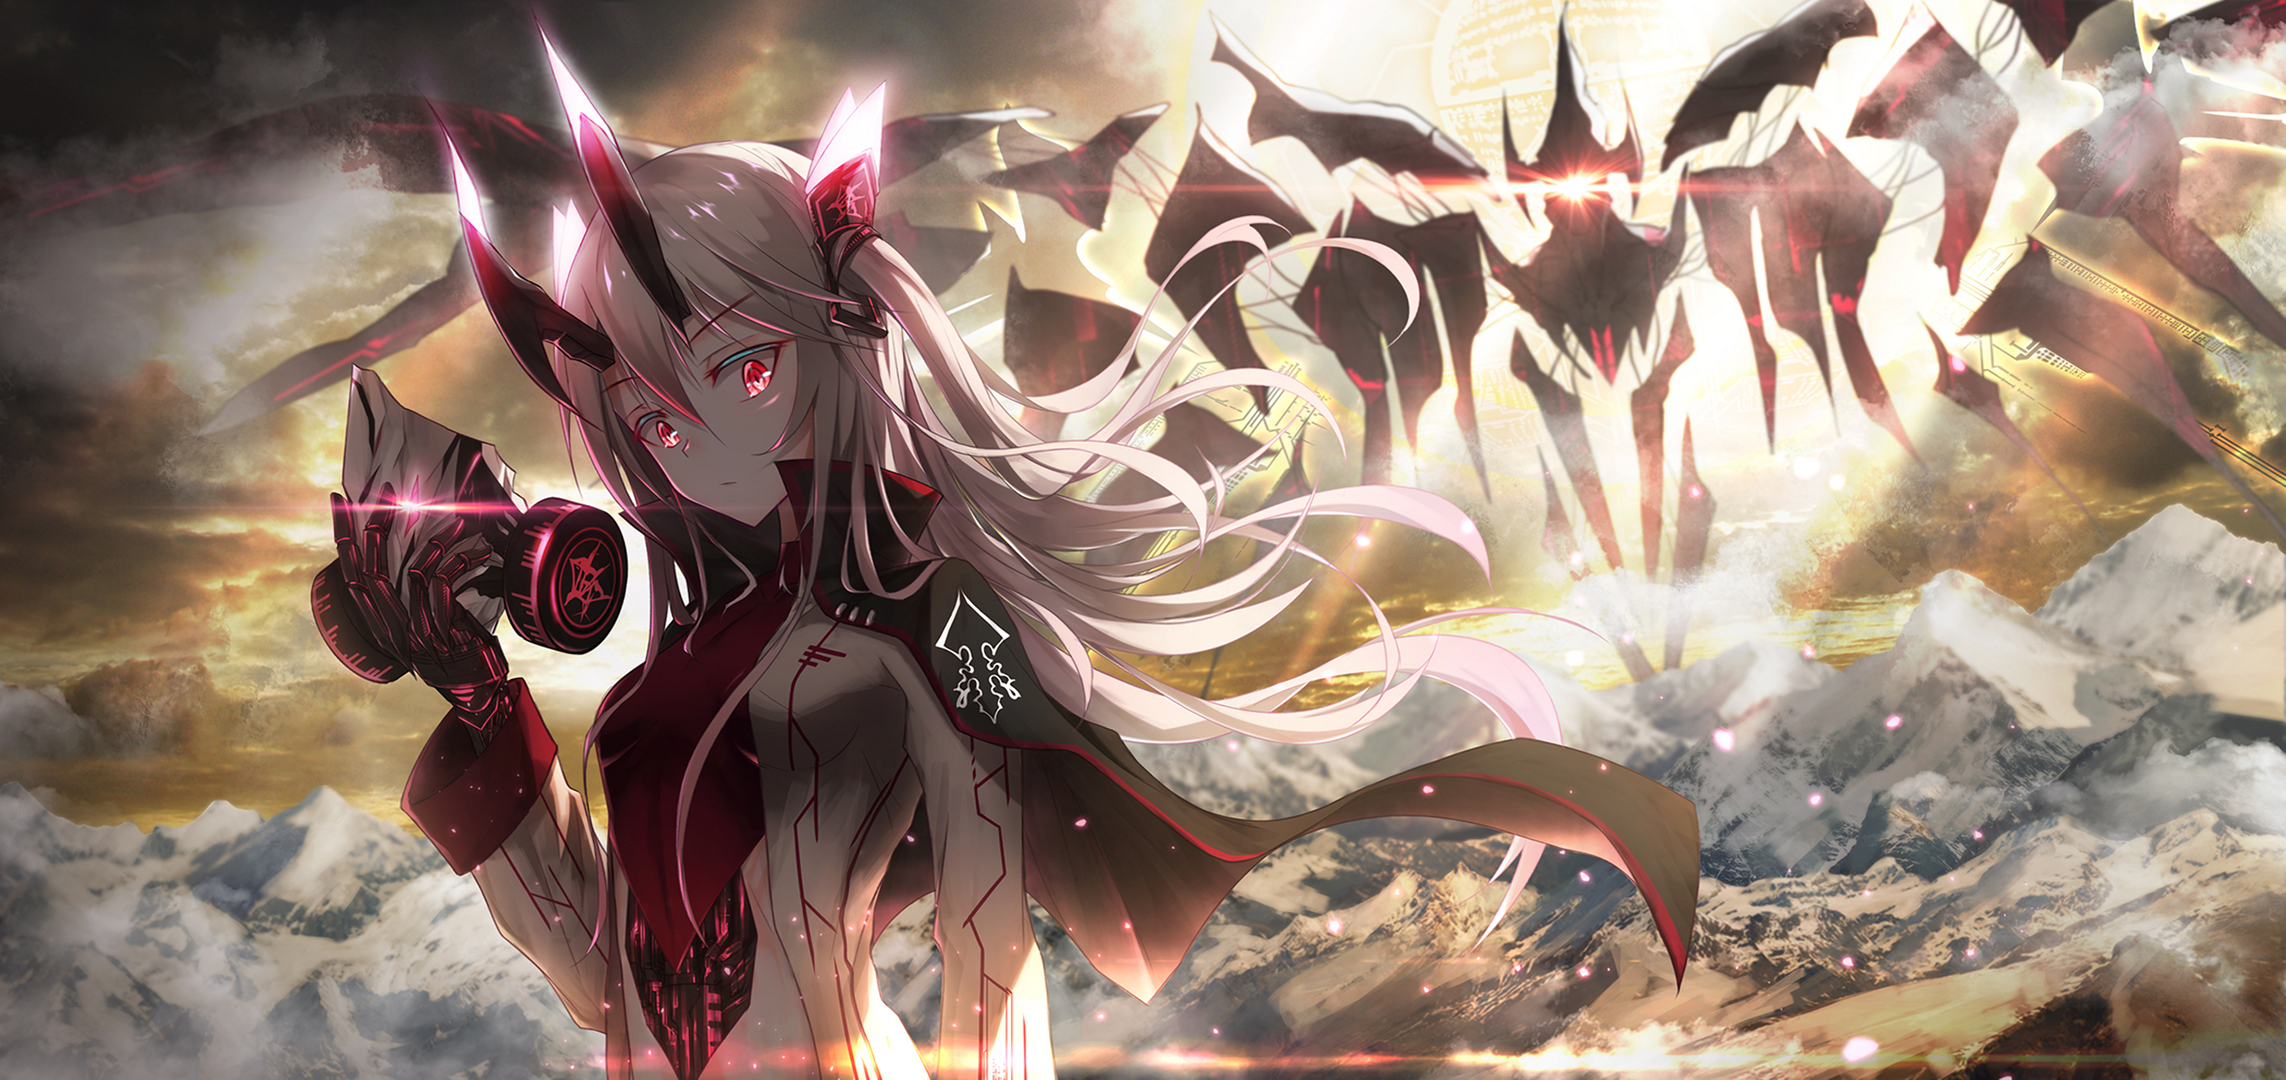 Anime 2286x1080 anime anime girls mask red eyes glowing eyes silver hair gas masks horns Bae.C